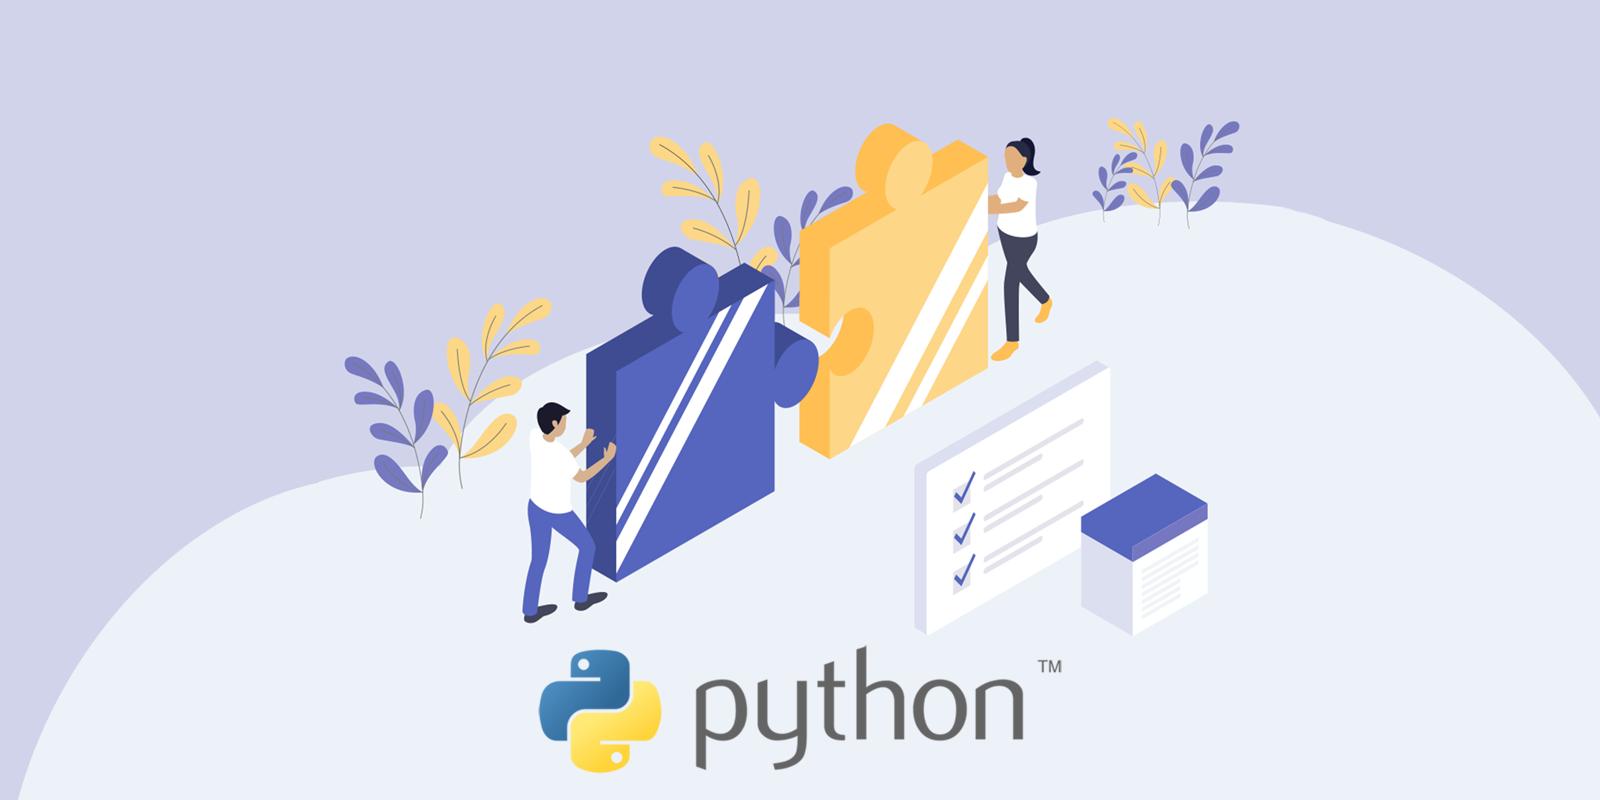 Corso in Programmazione Python Tivoli Forma Academy deep learning-1600x800